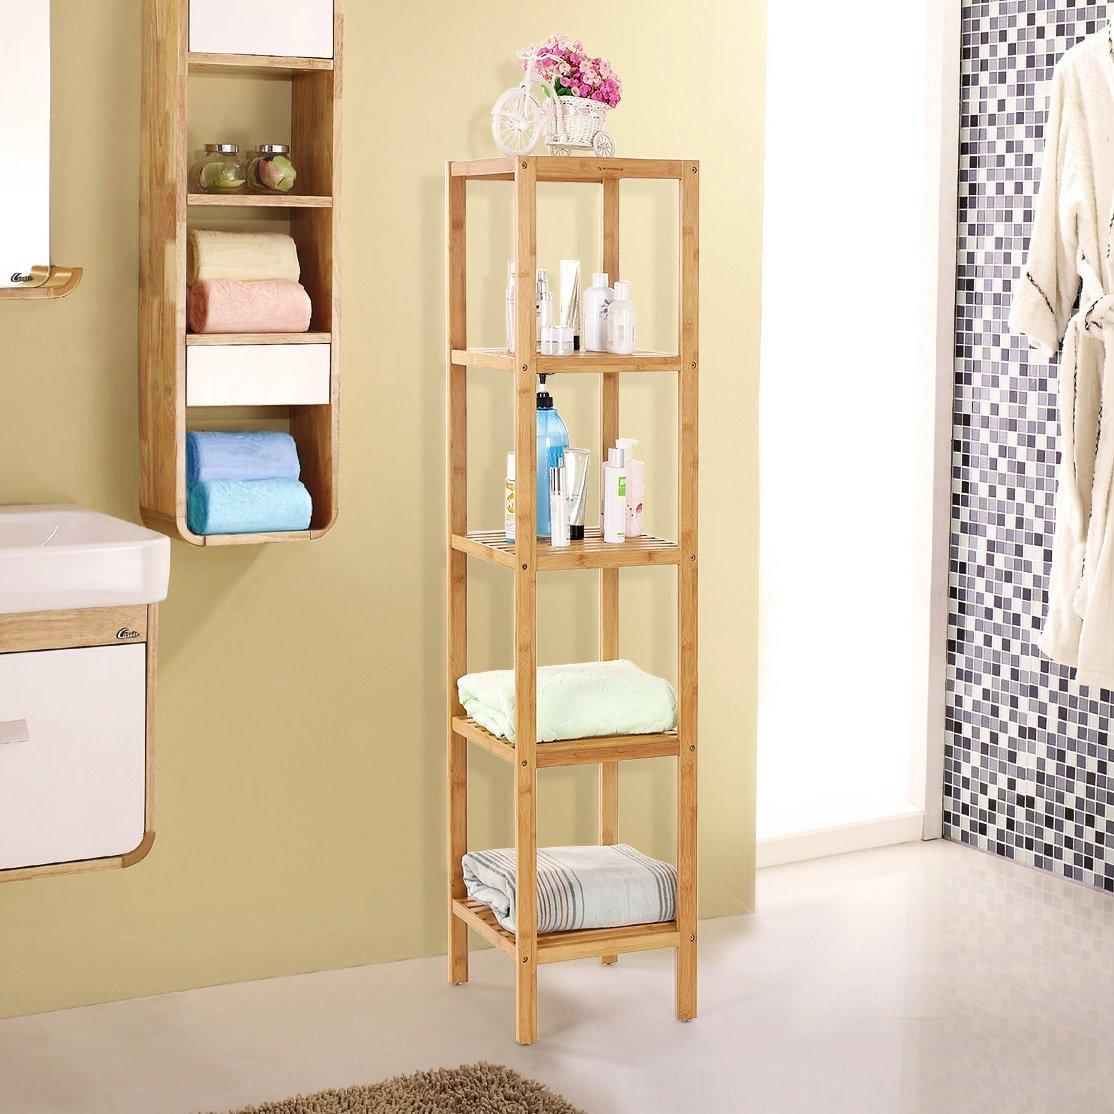 SONGMICS Narrow Shelving Unit Bathroom Shelf 5-Tier Multifunctional Storage 100% Bamboo Wood Corner Rack for Kitchen Livingroom Bedroom UBCB55Y by SONGMICS (Image #2)